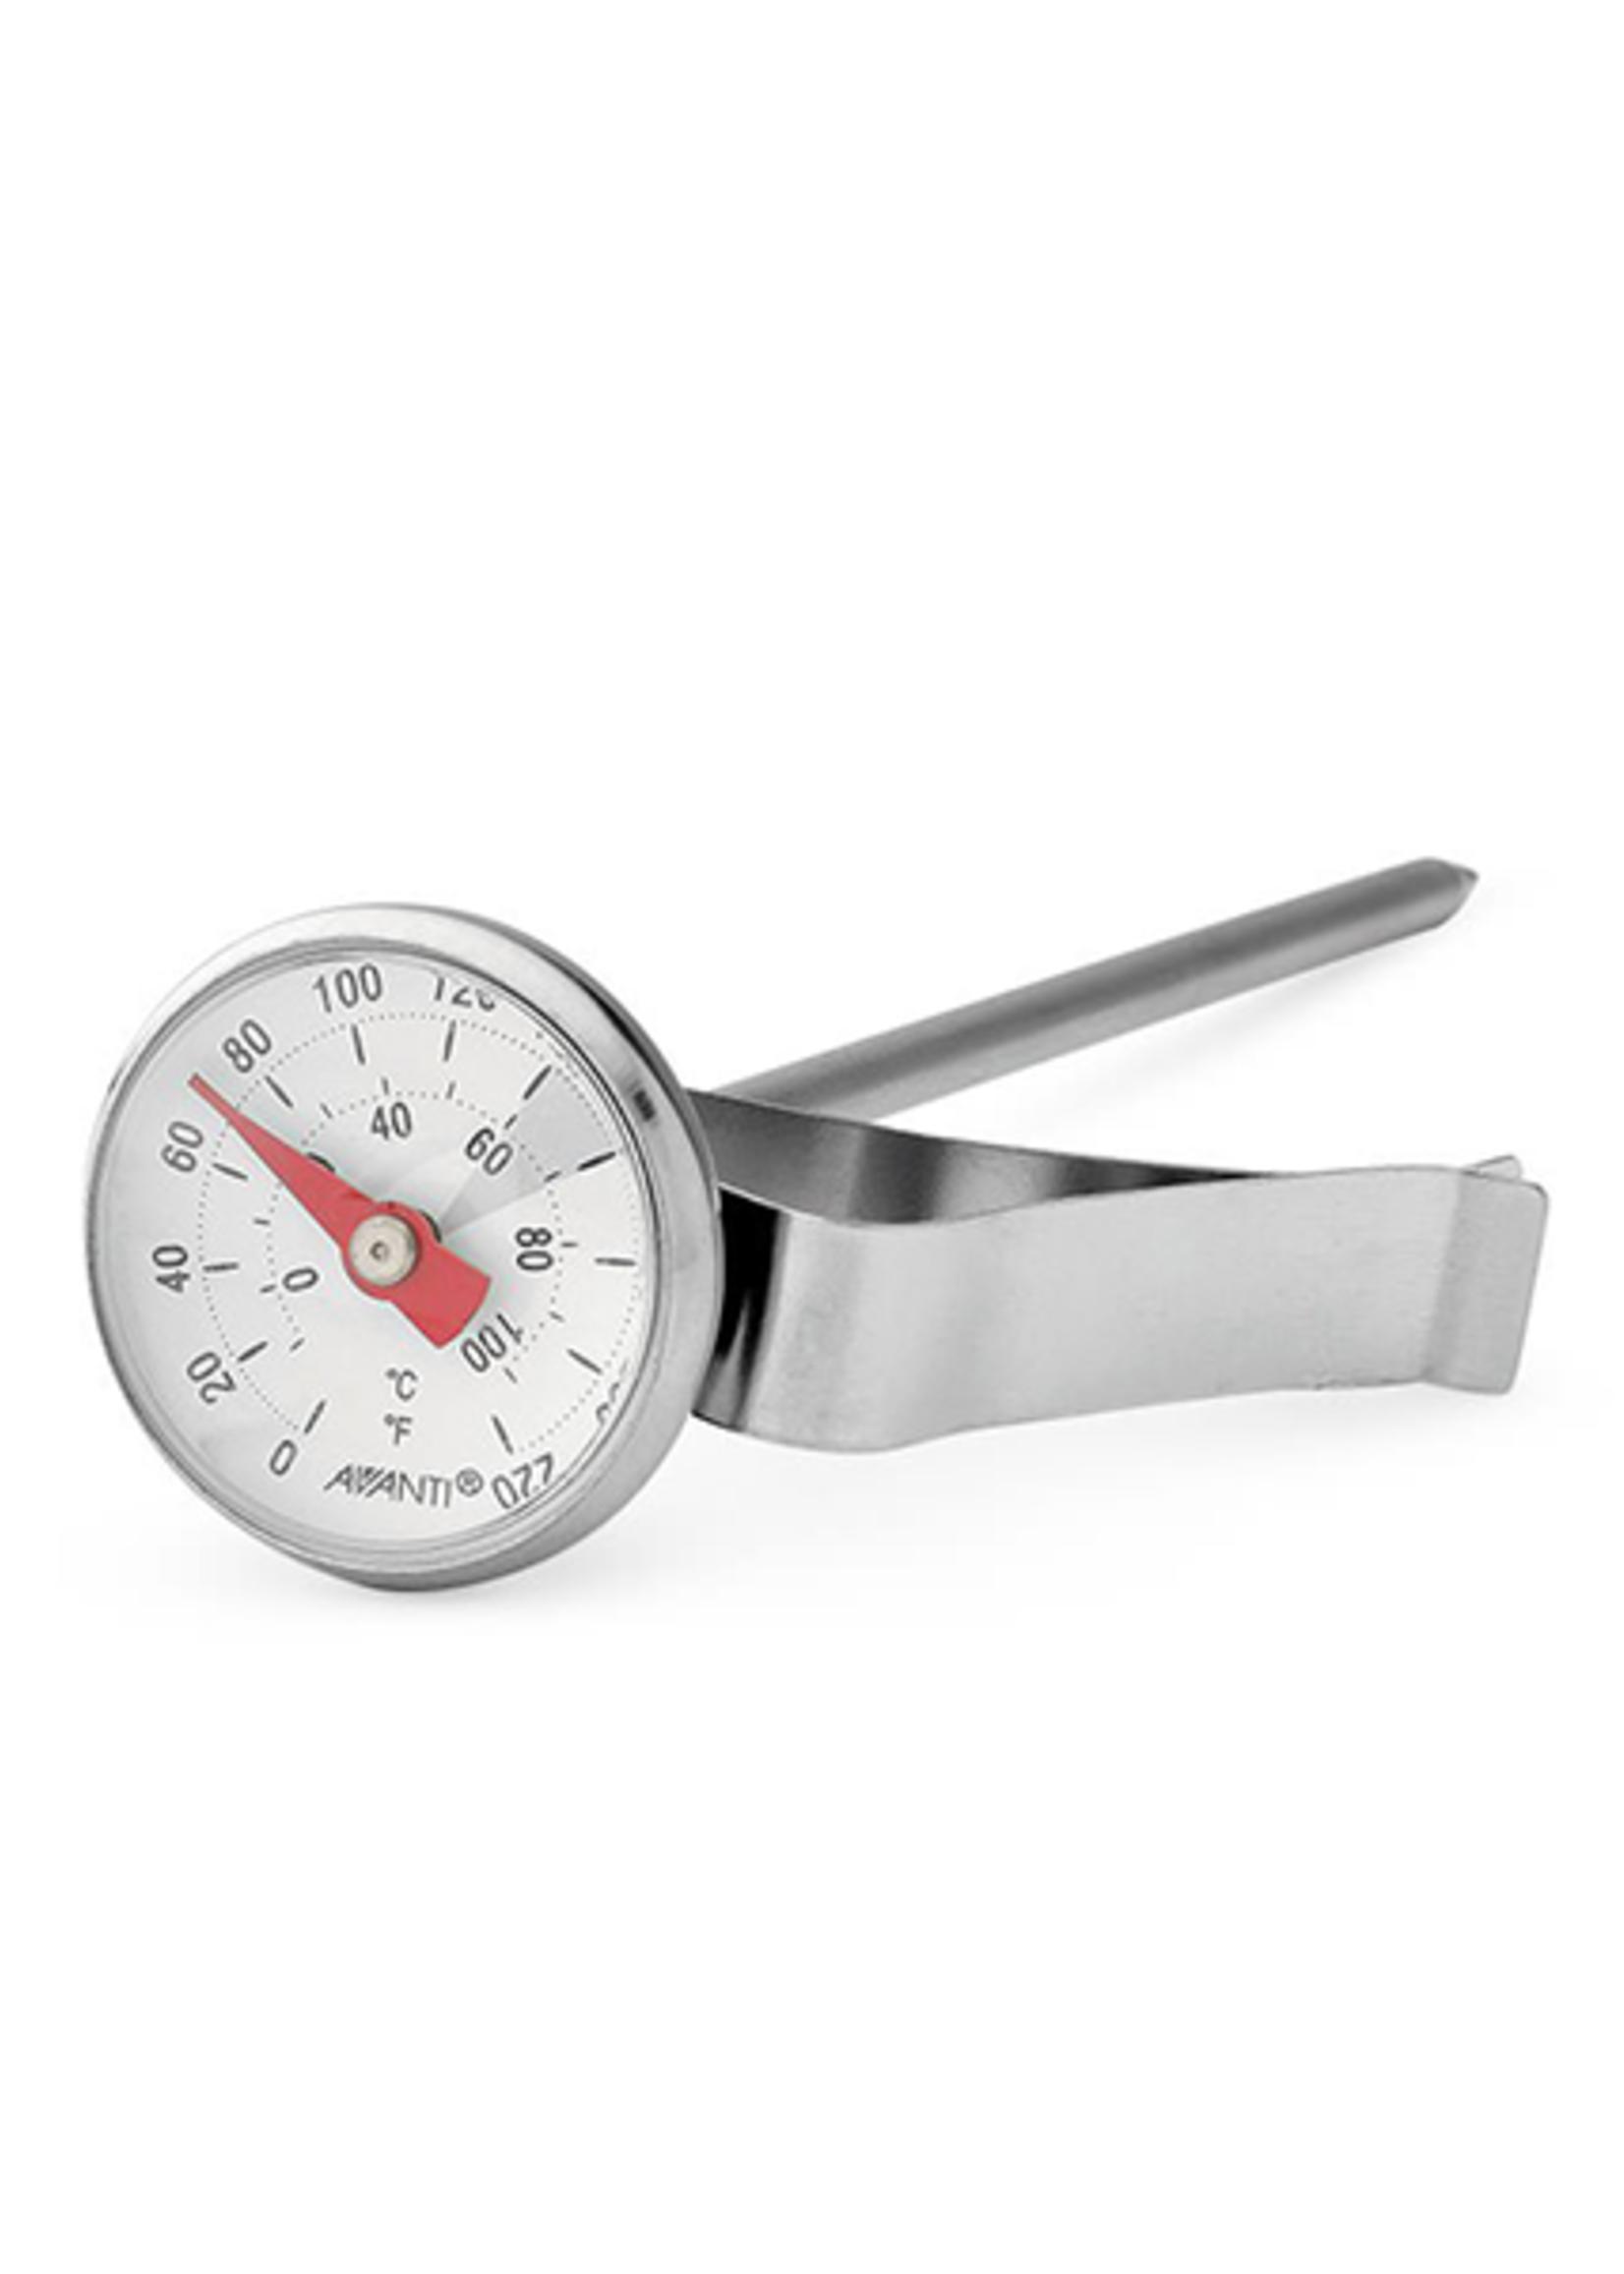 Avanti Homewares Tempwiz Milk Frothing Thermometer